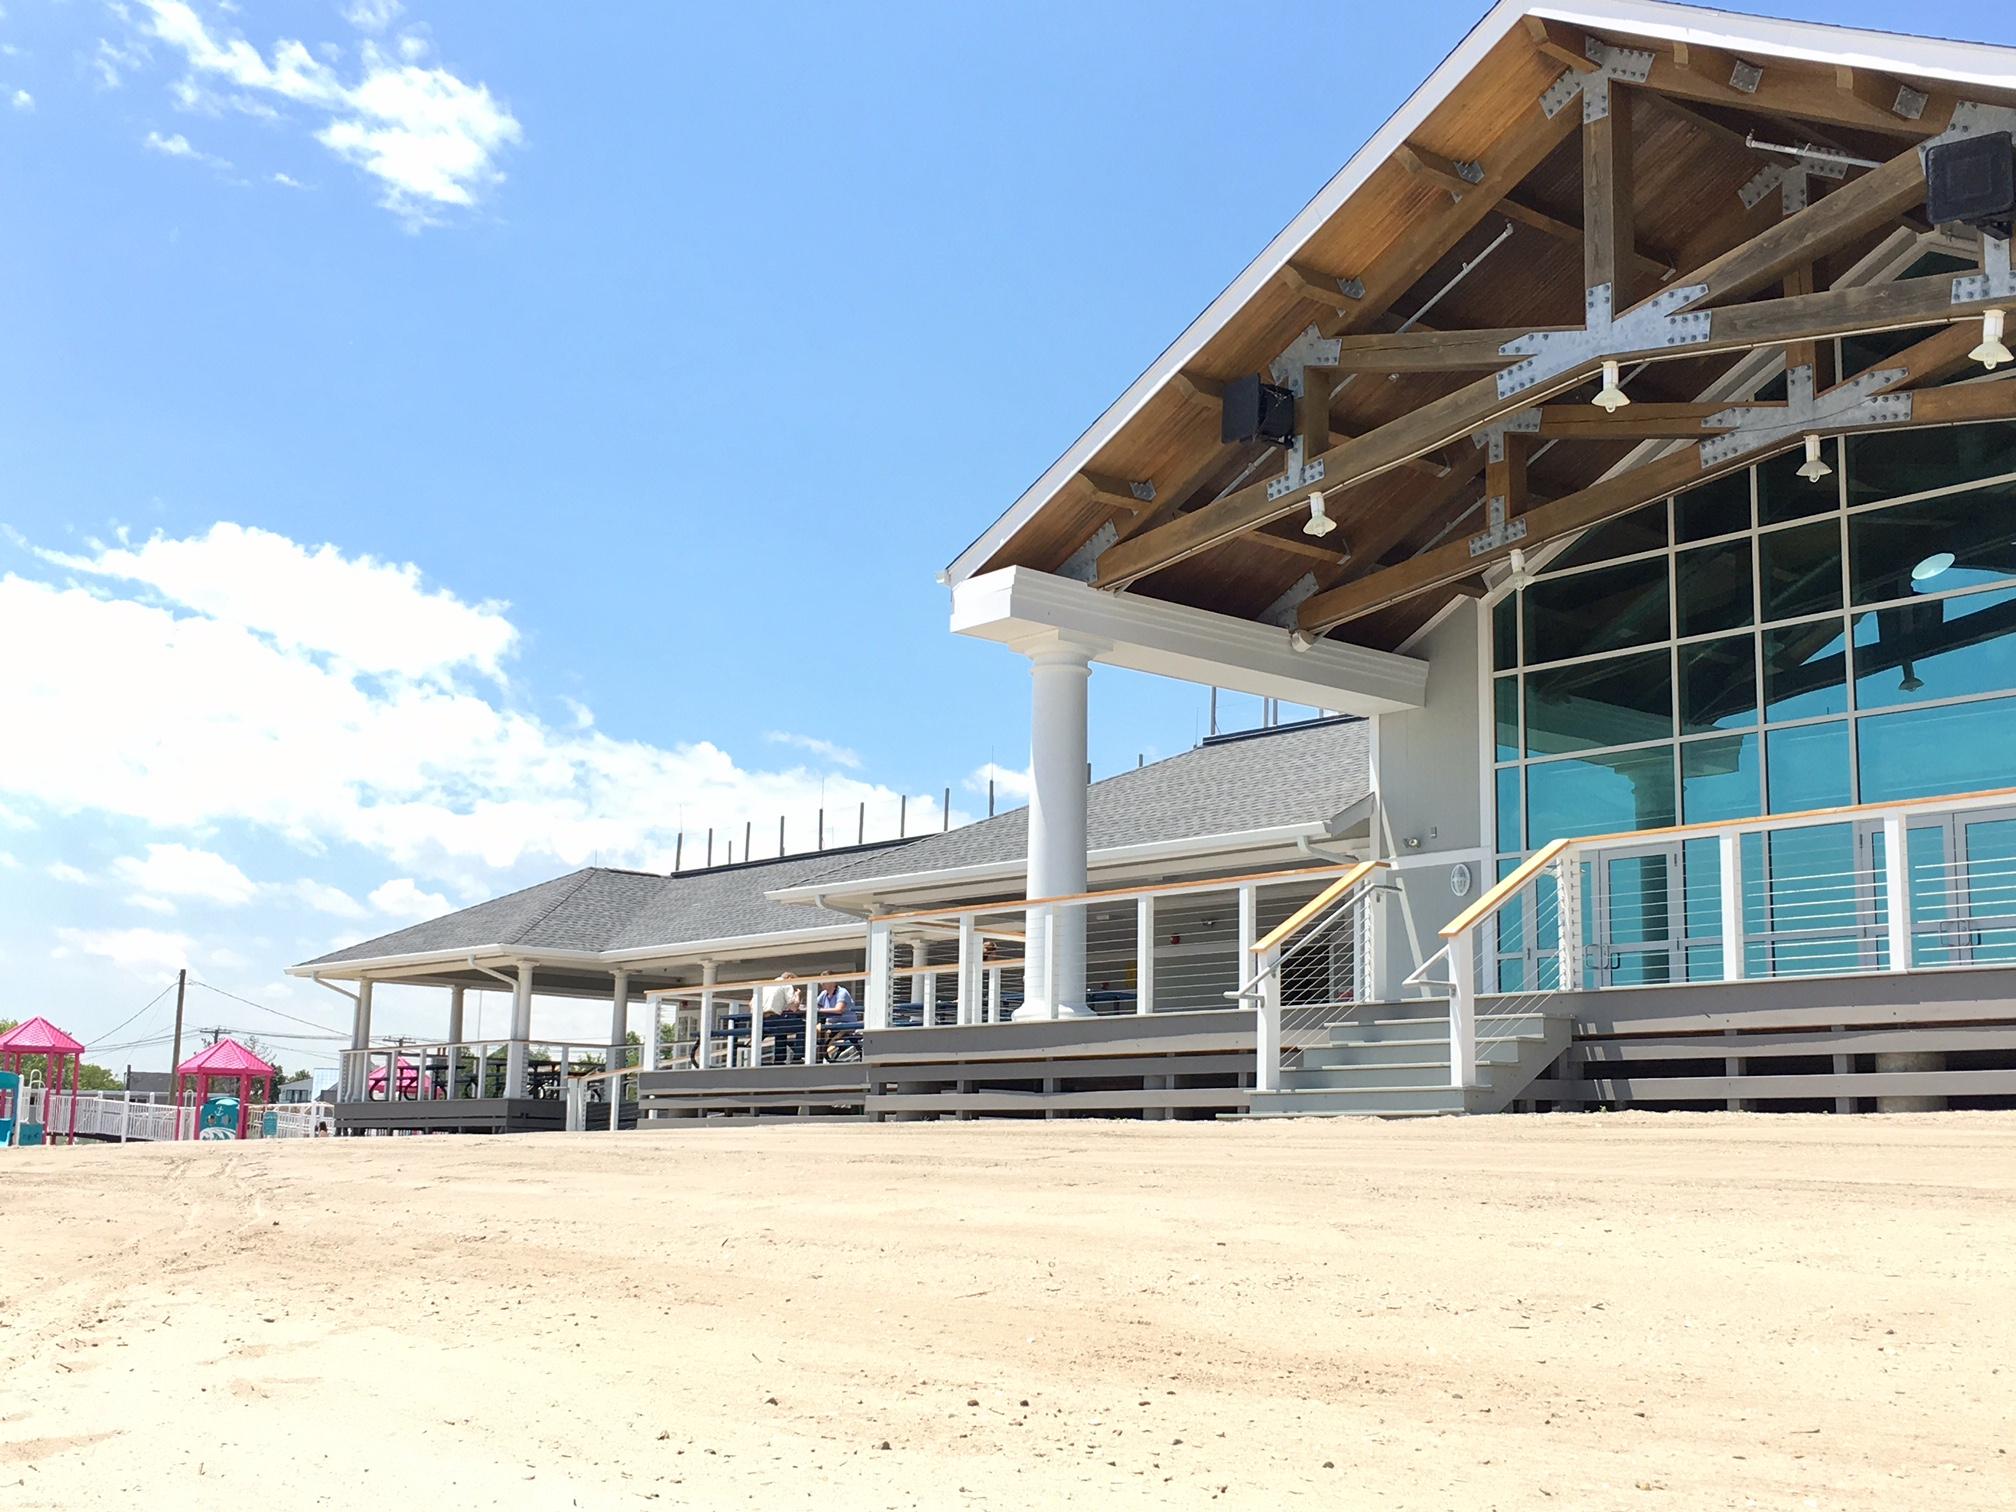 Penfield Pavilion re-opens after Sandy damage